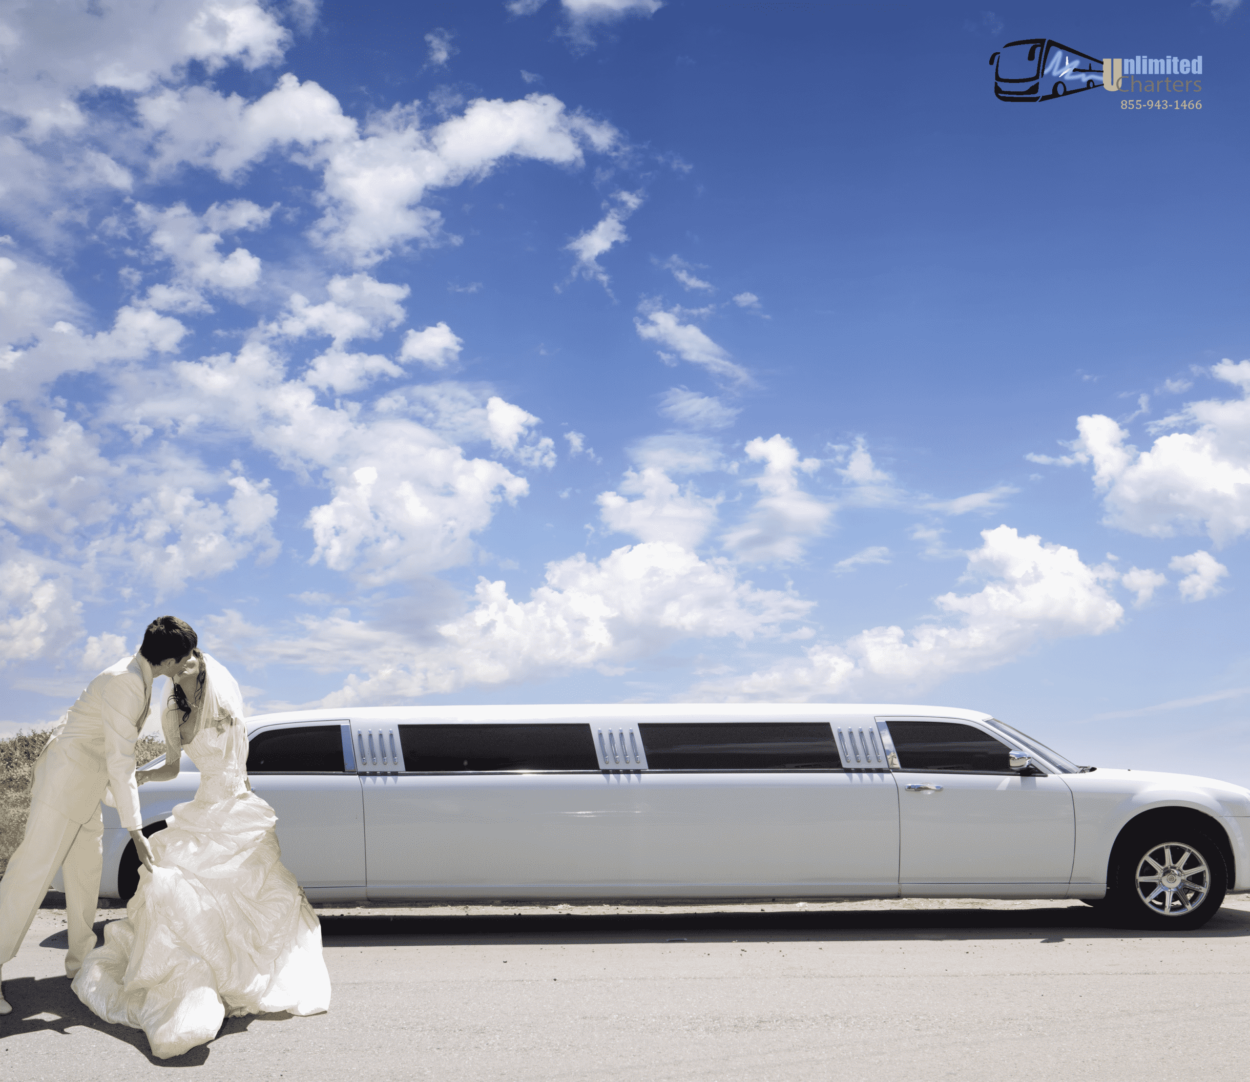 Wedding Limousine Transportation